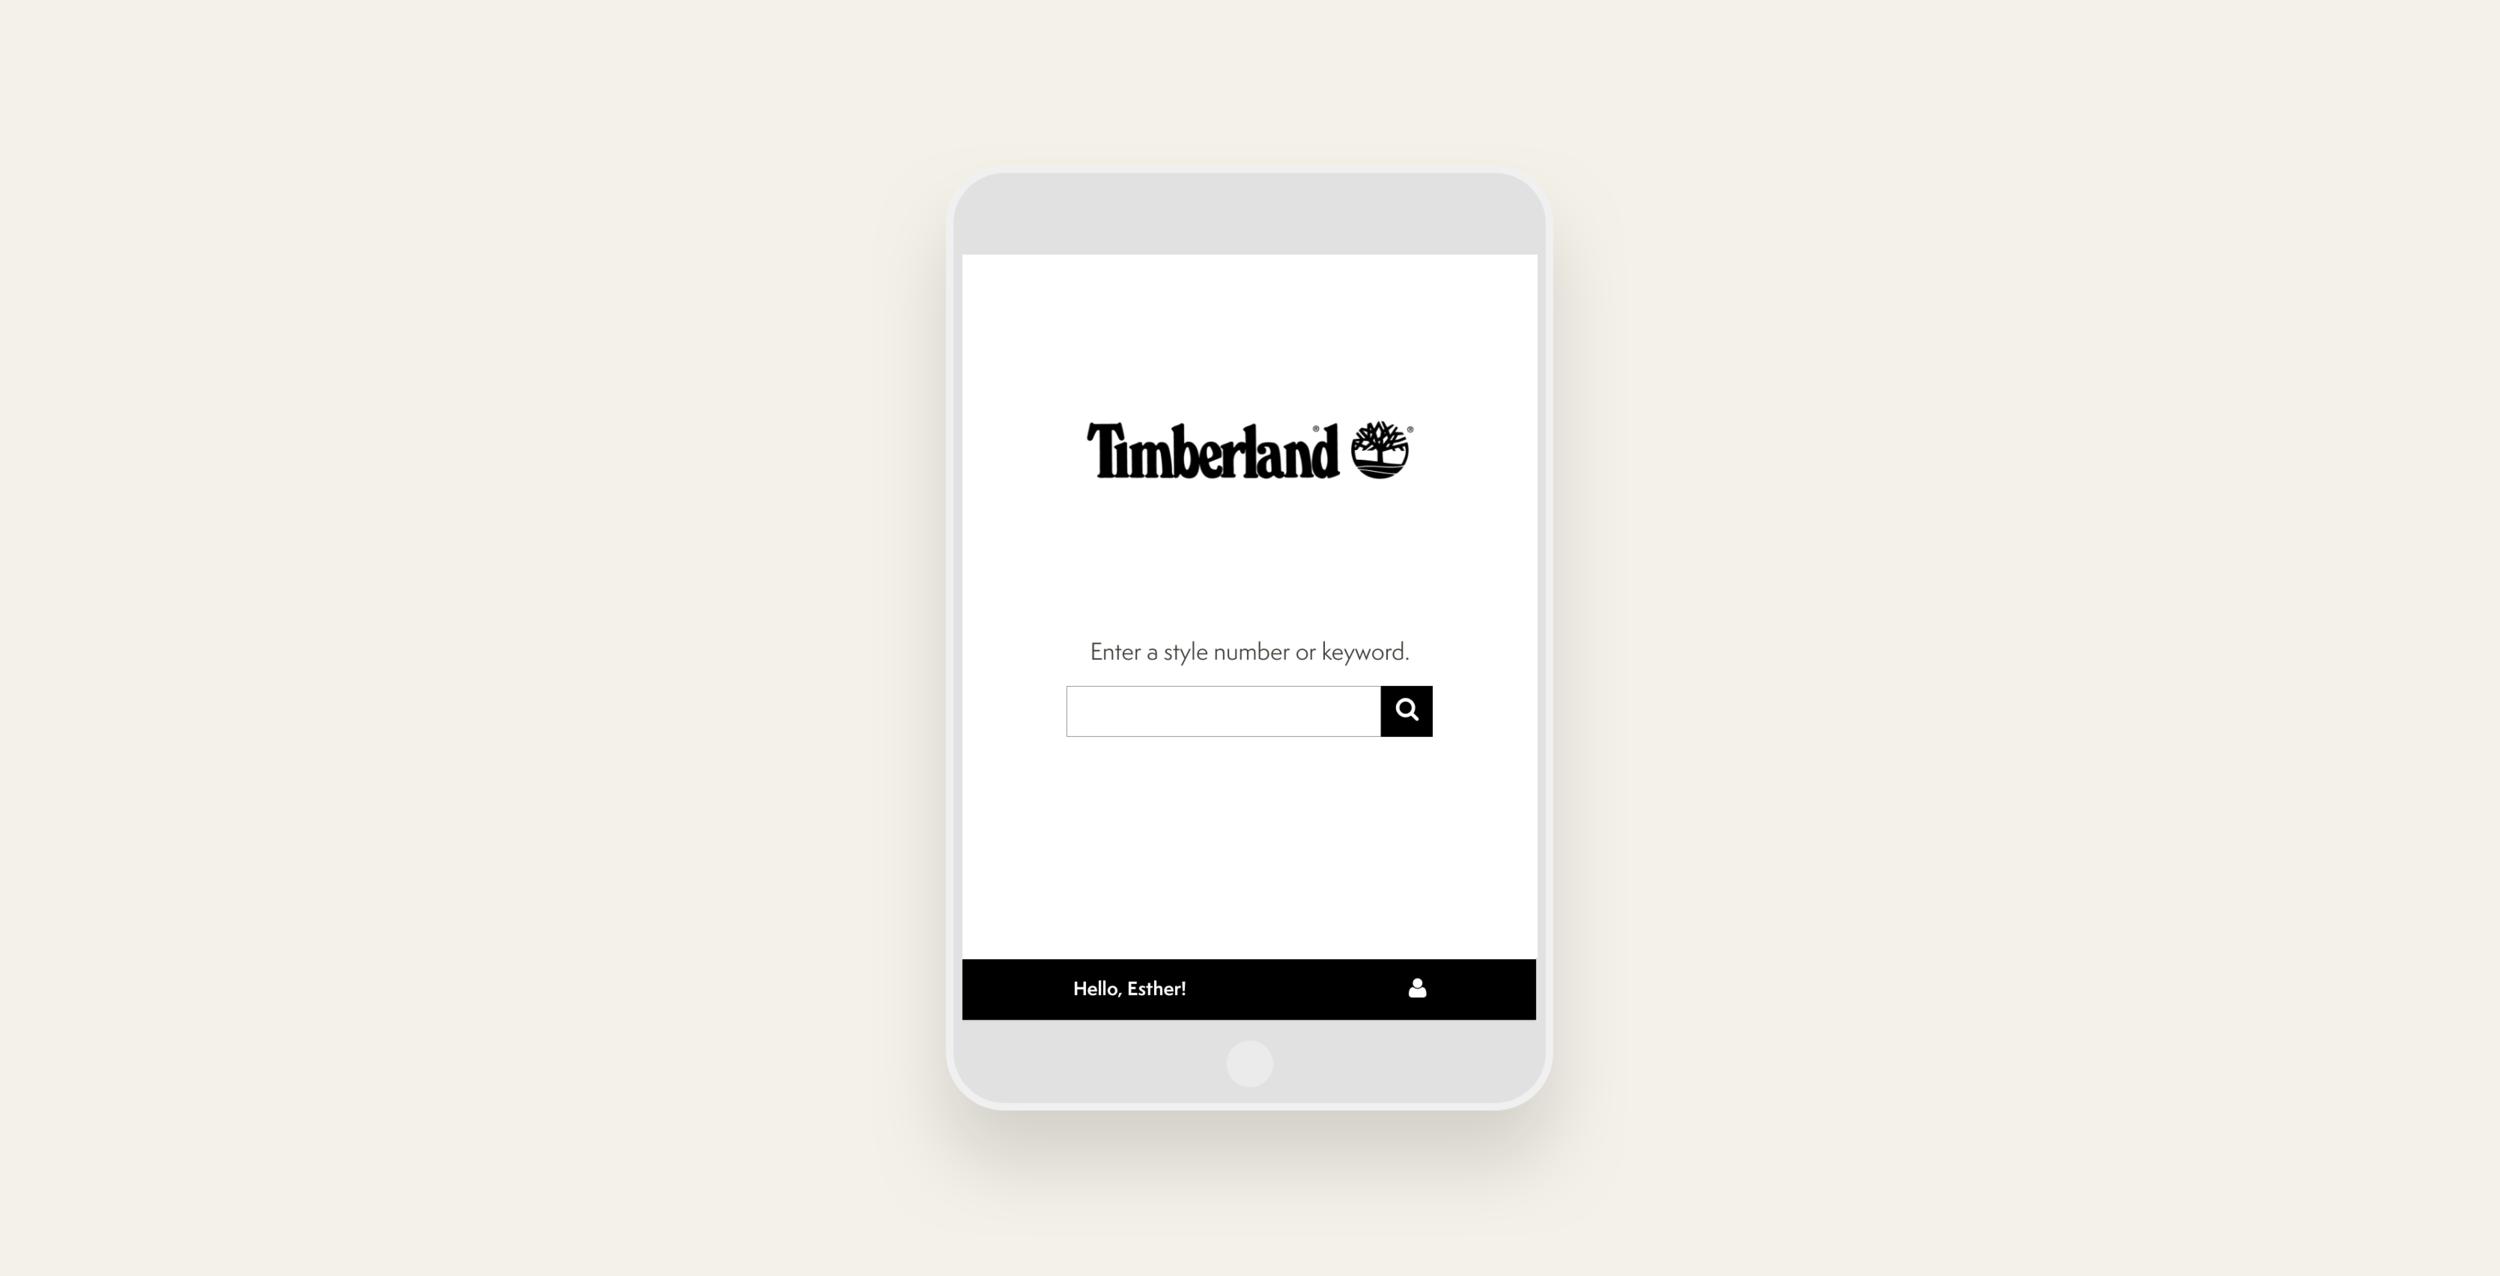 Timberland-Staff-1.png